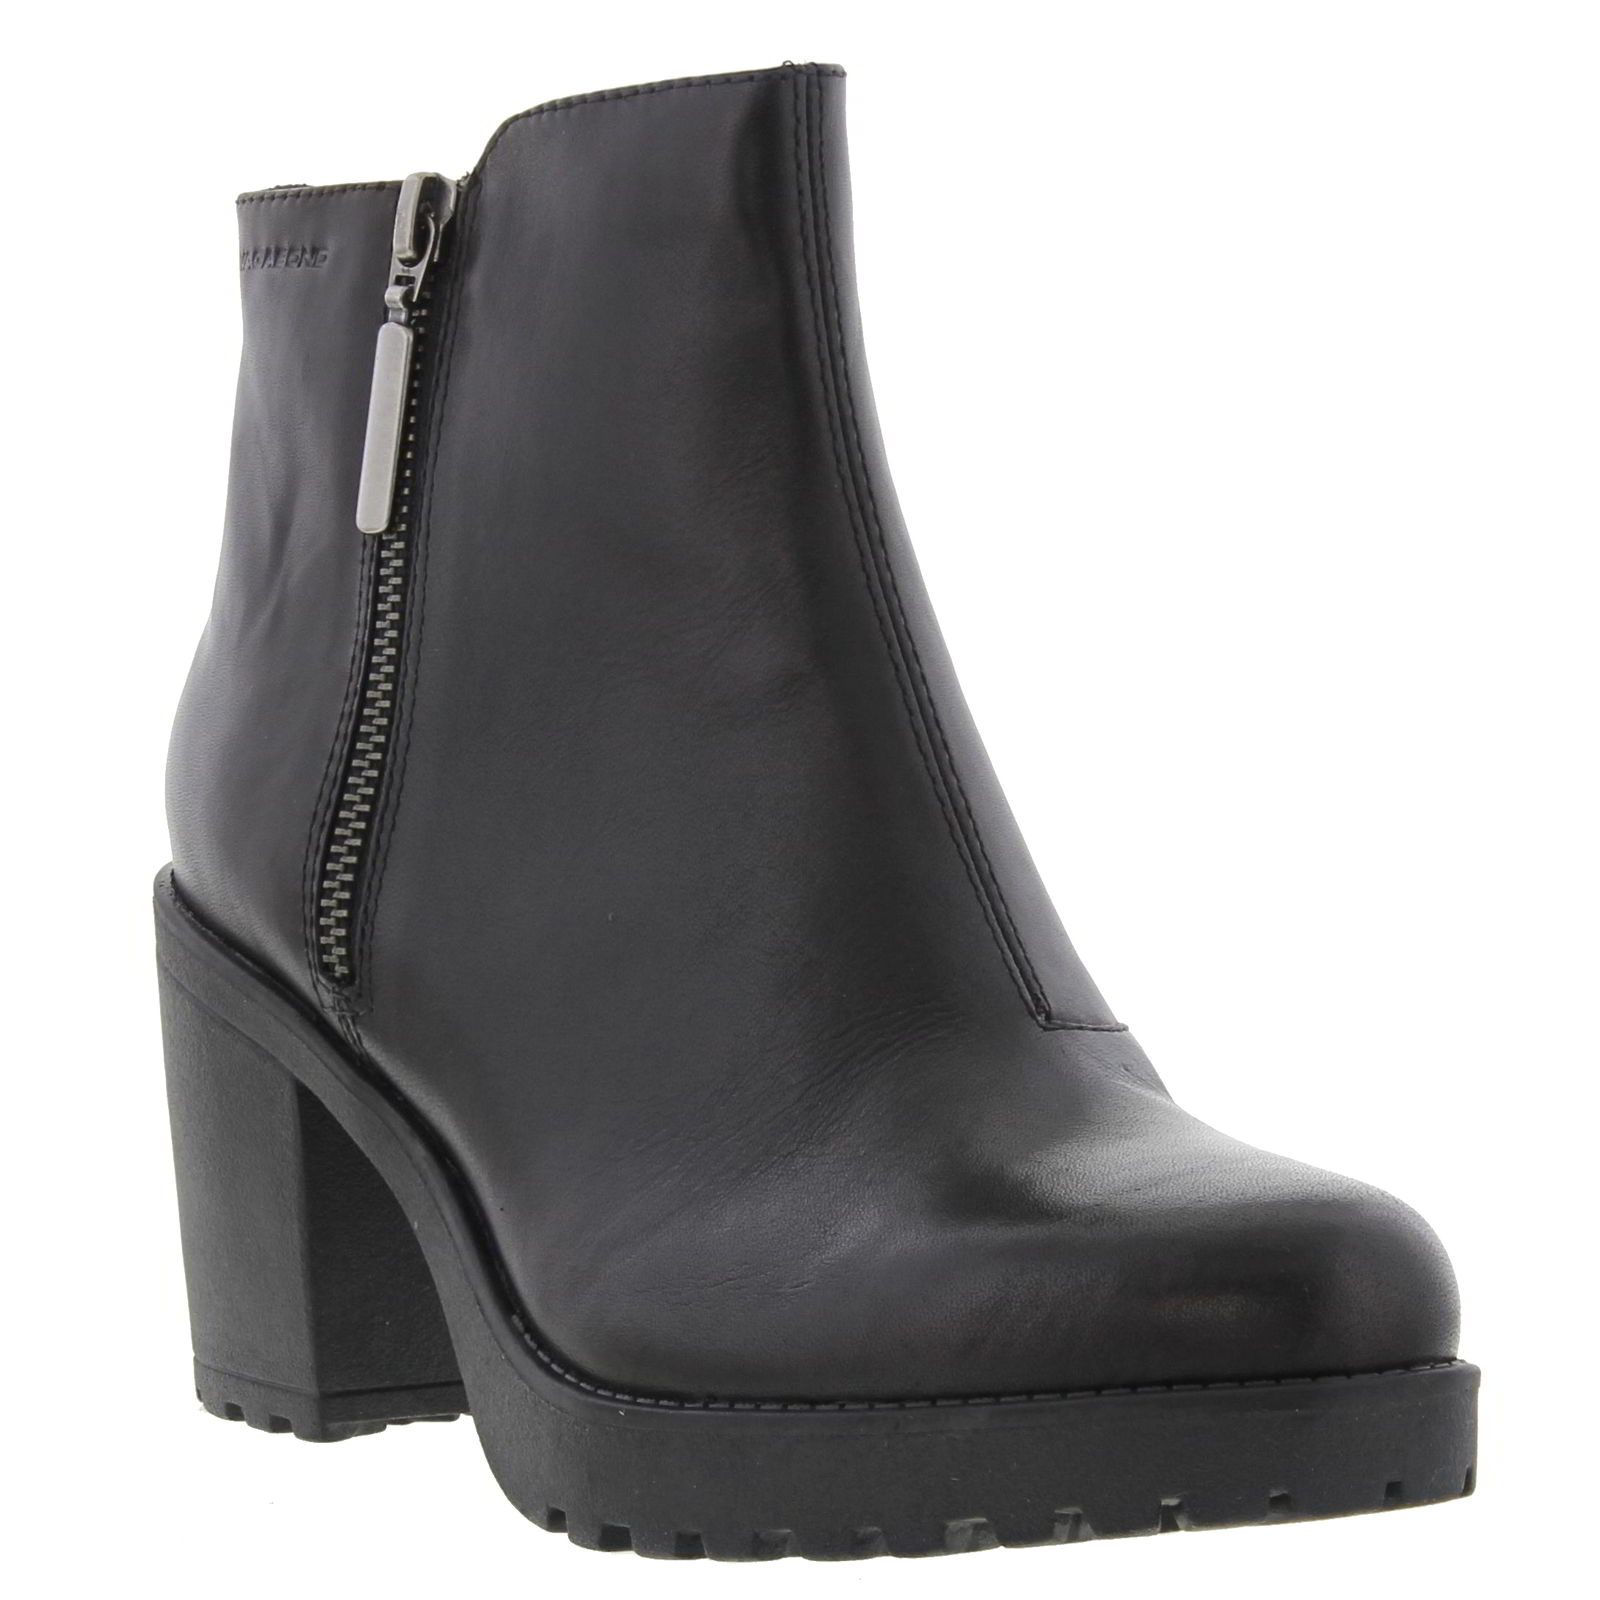 Vagabond Grace 4228 301 Womens Black Leather Heels Chelsea